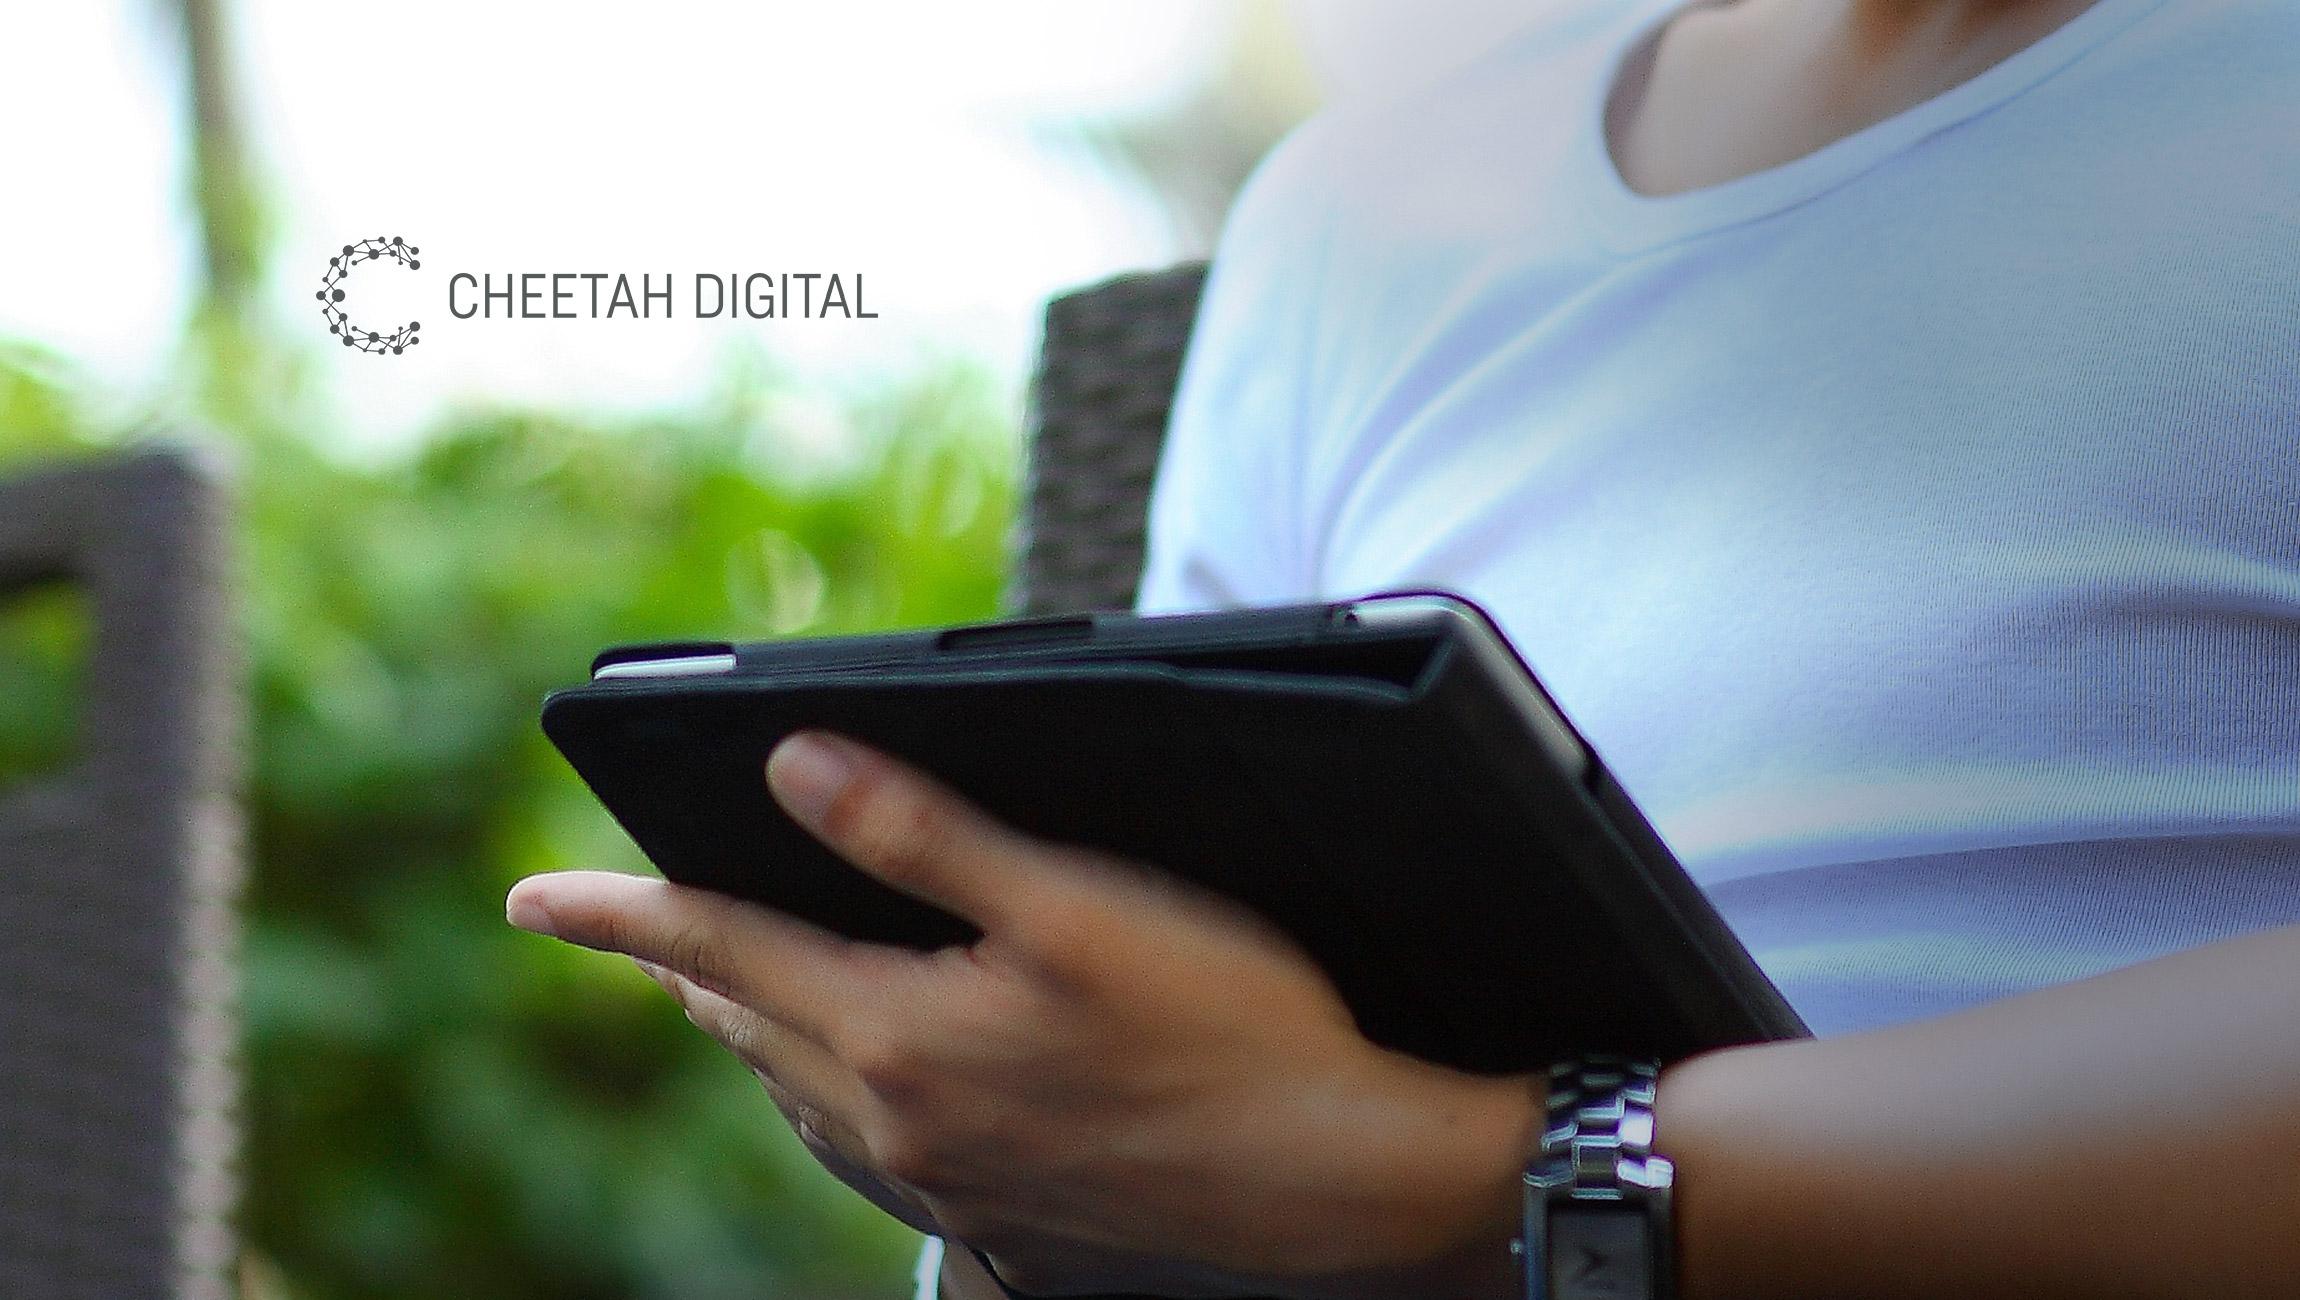 Cheetah Digital Debuts Email Marketing Enhancement Products